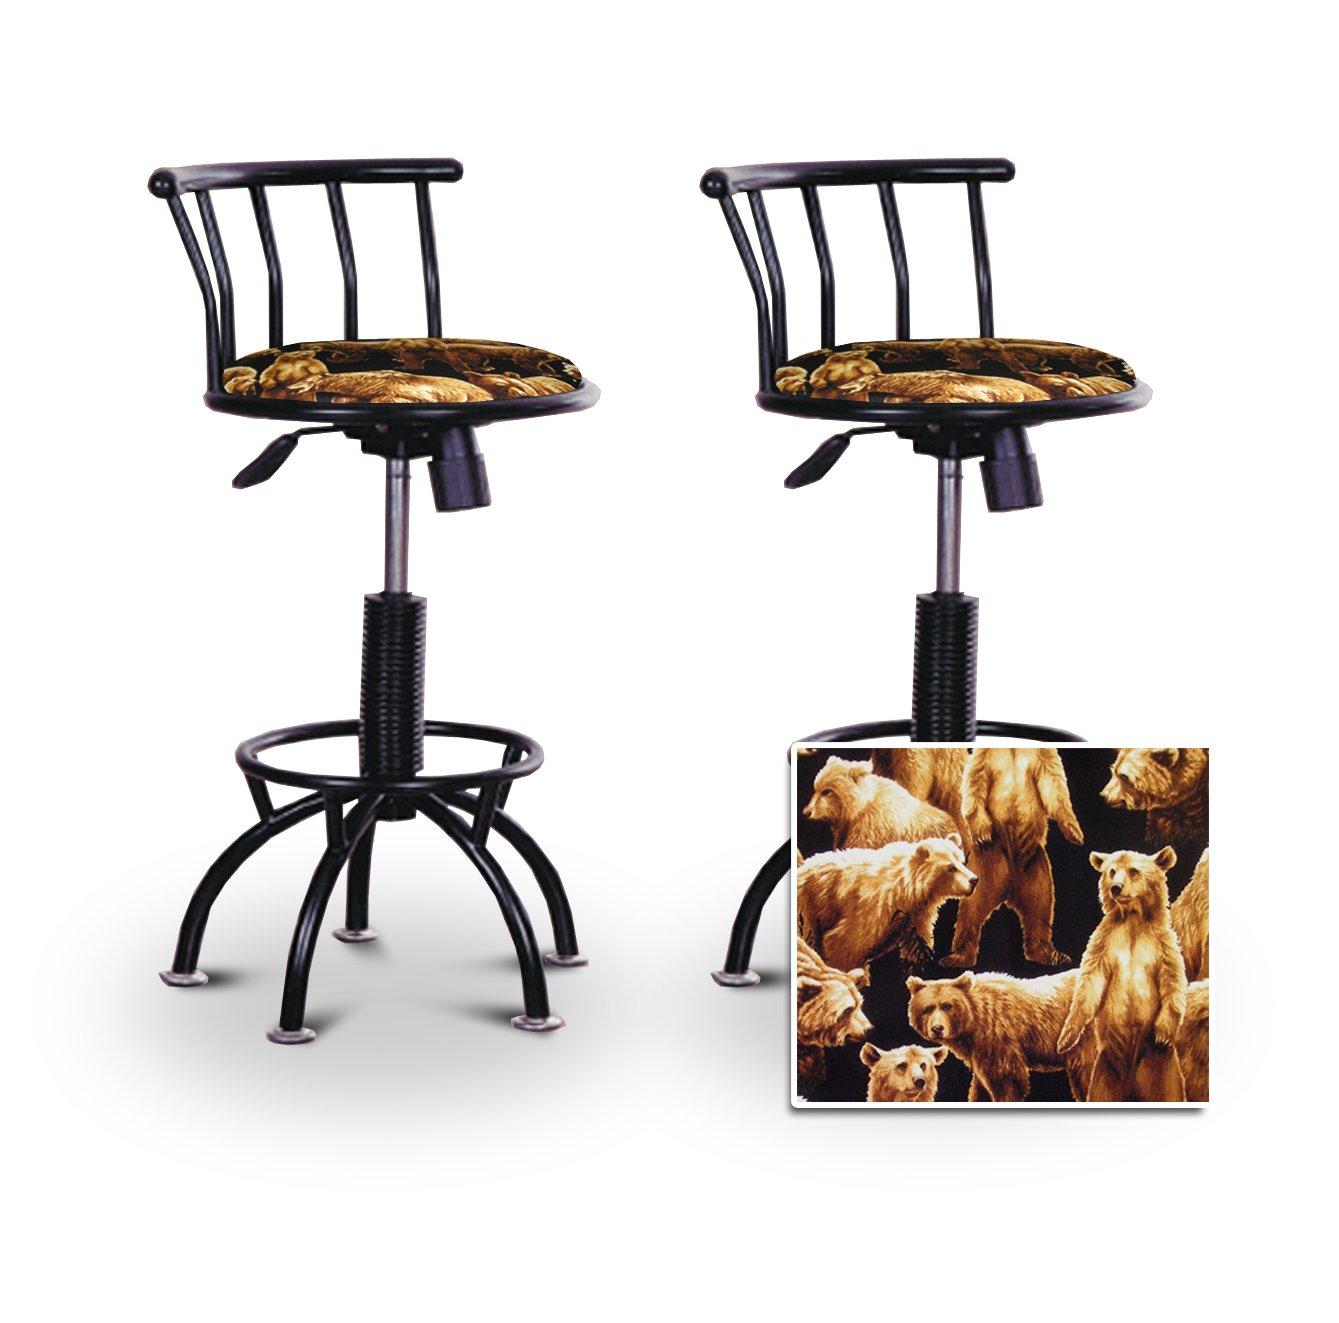 2 24''-29'' Grizzly Bear Hunting Wild Animal Black Adjustable Specialty / Custom Barstools Set